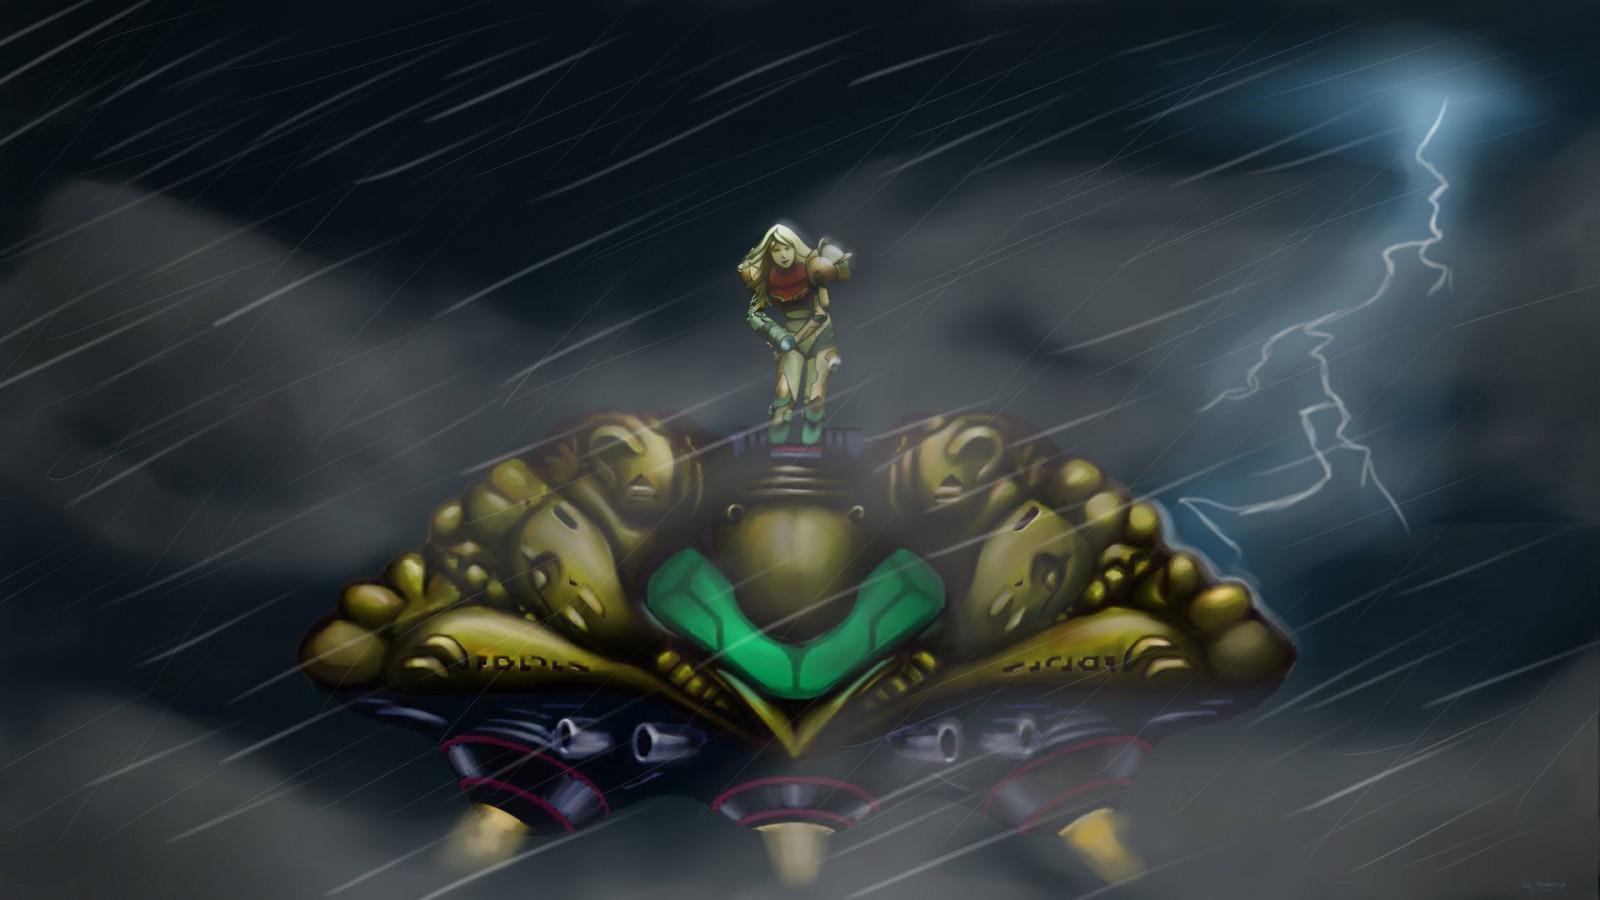 Metroid Samus Aran Super